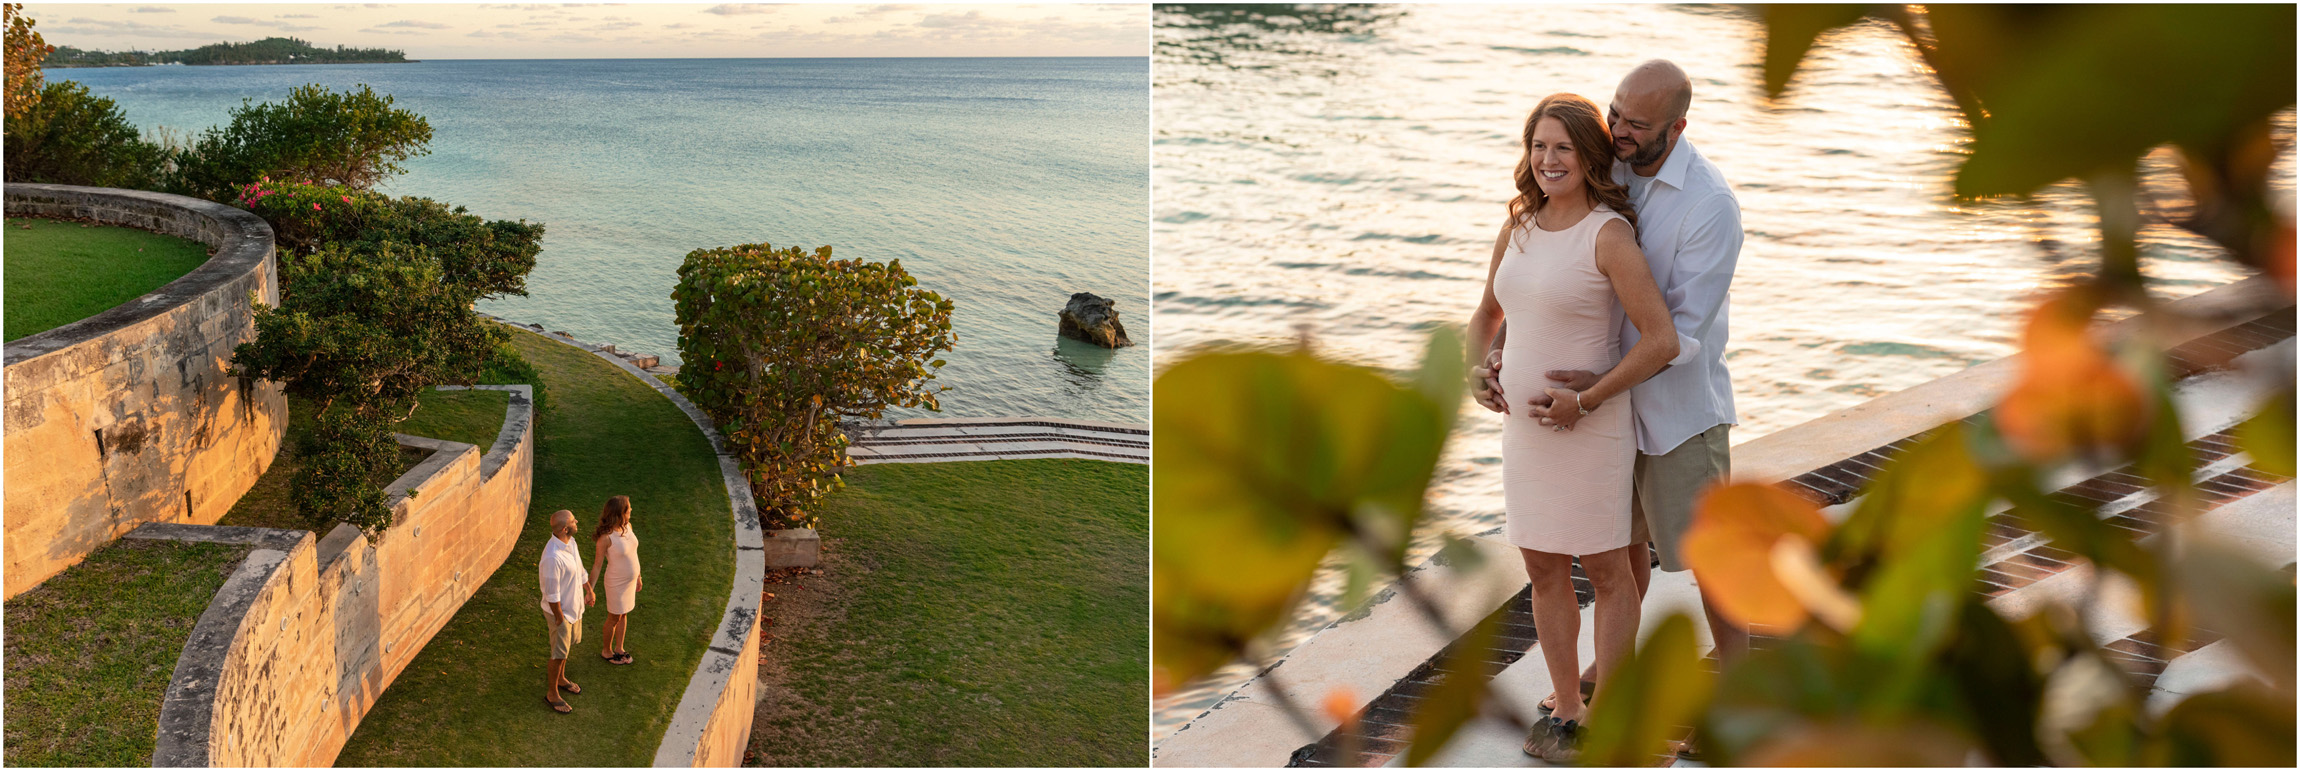 ©FianderFoto_Bermuda Maternity Photographer_Elys Harbour_Ft Scaur_Airbnb_Victoria_Mike_028.jpg